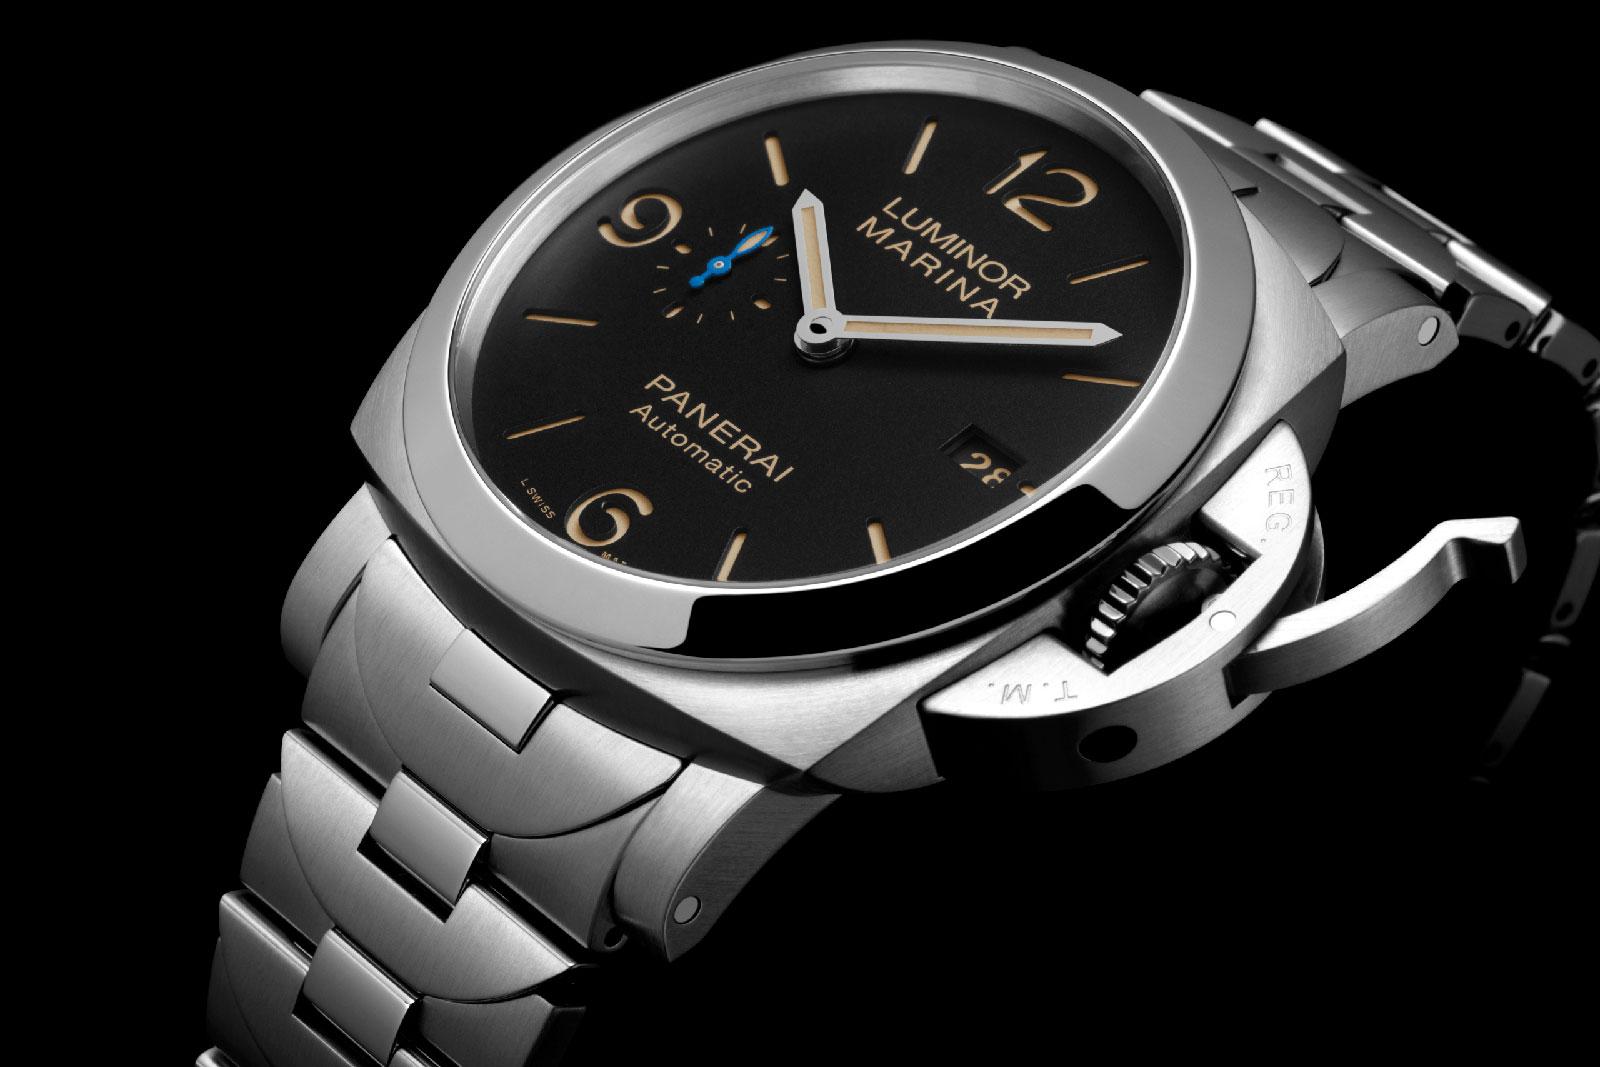 Panerai Luminor 1950 3 Days Automatic bracelet 44mm PAM723-1